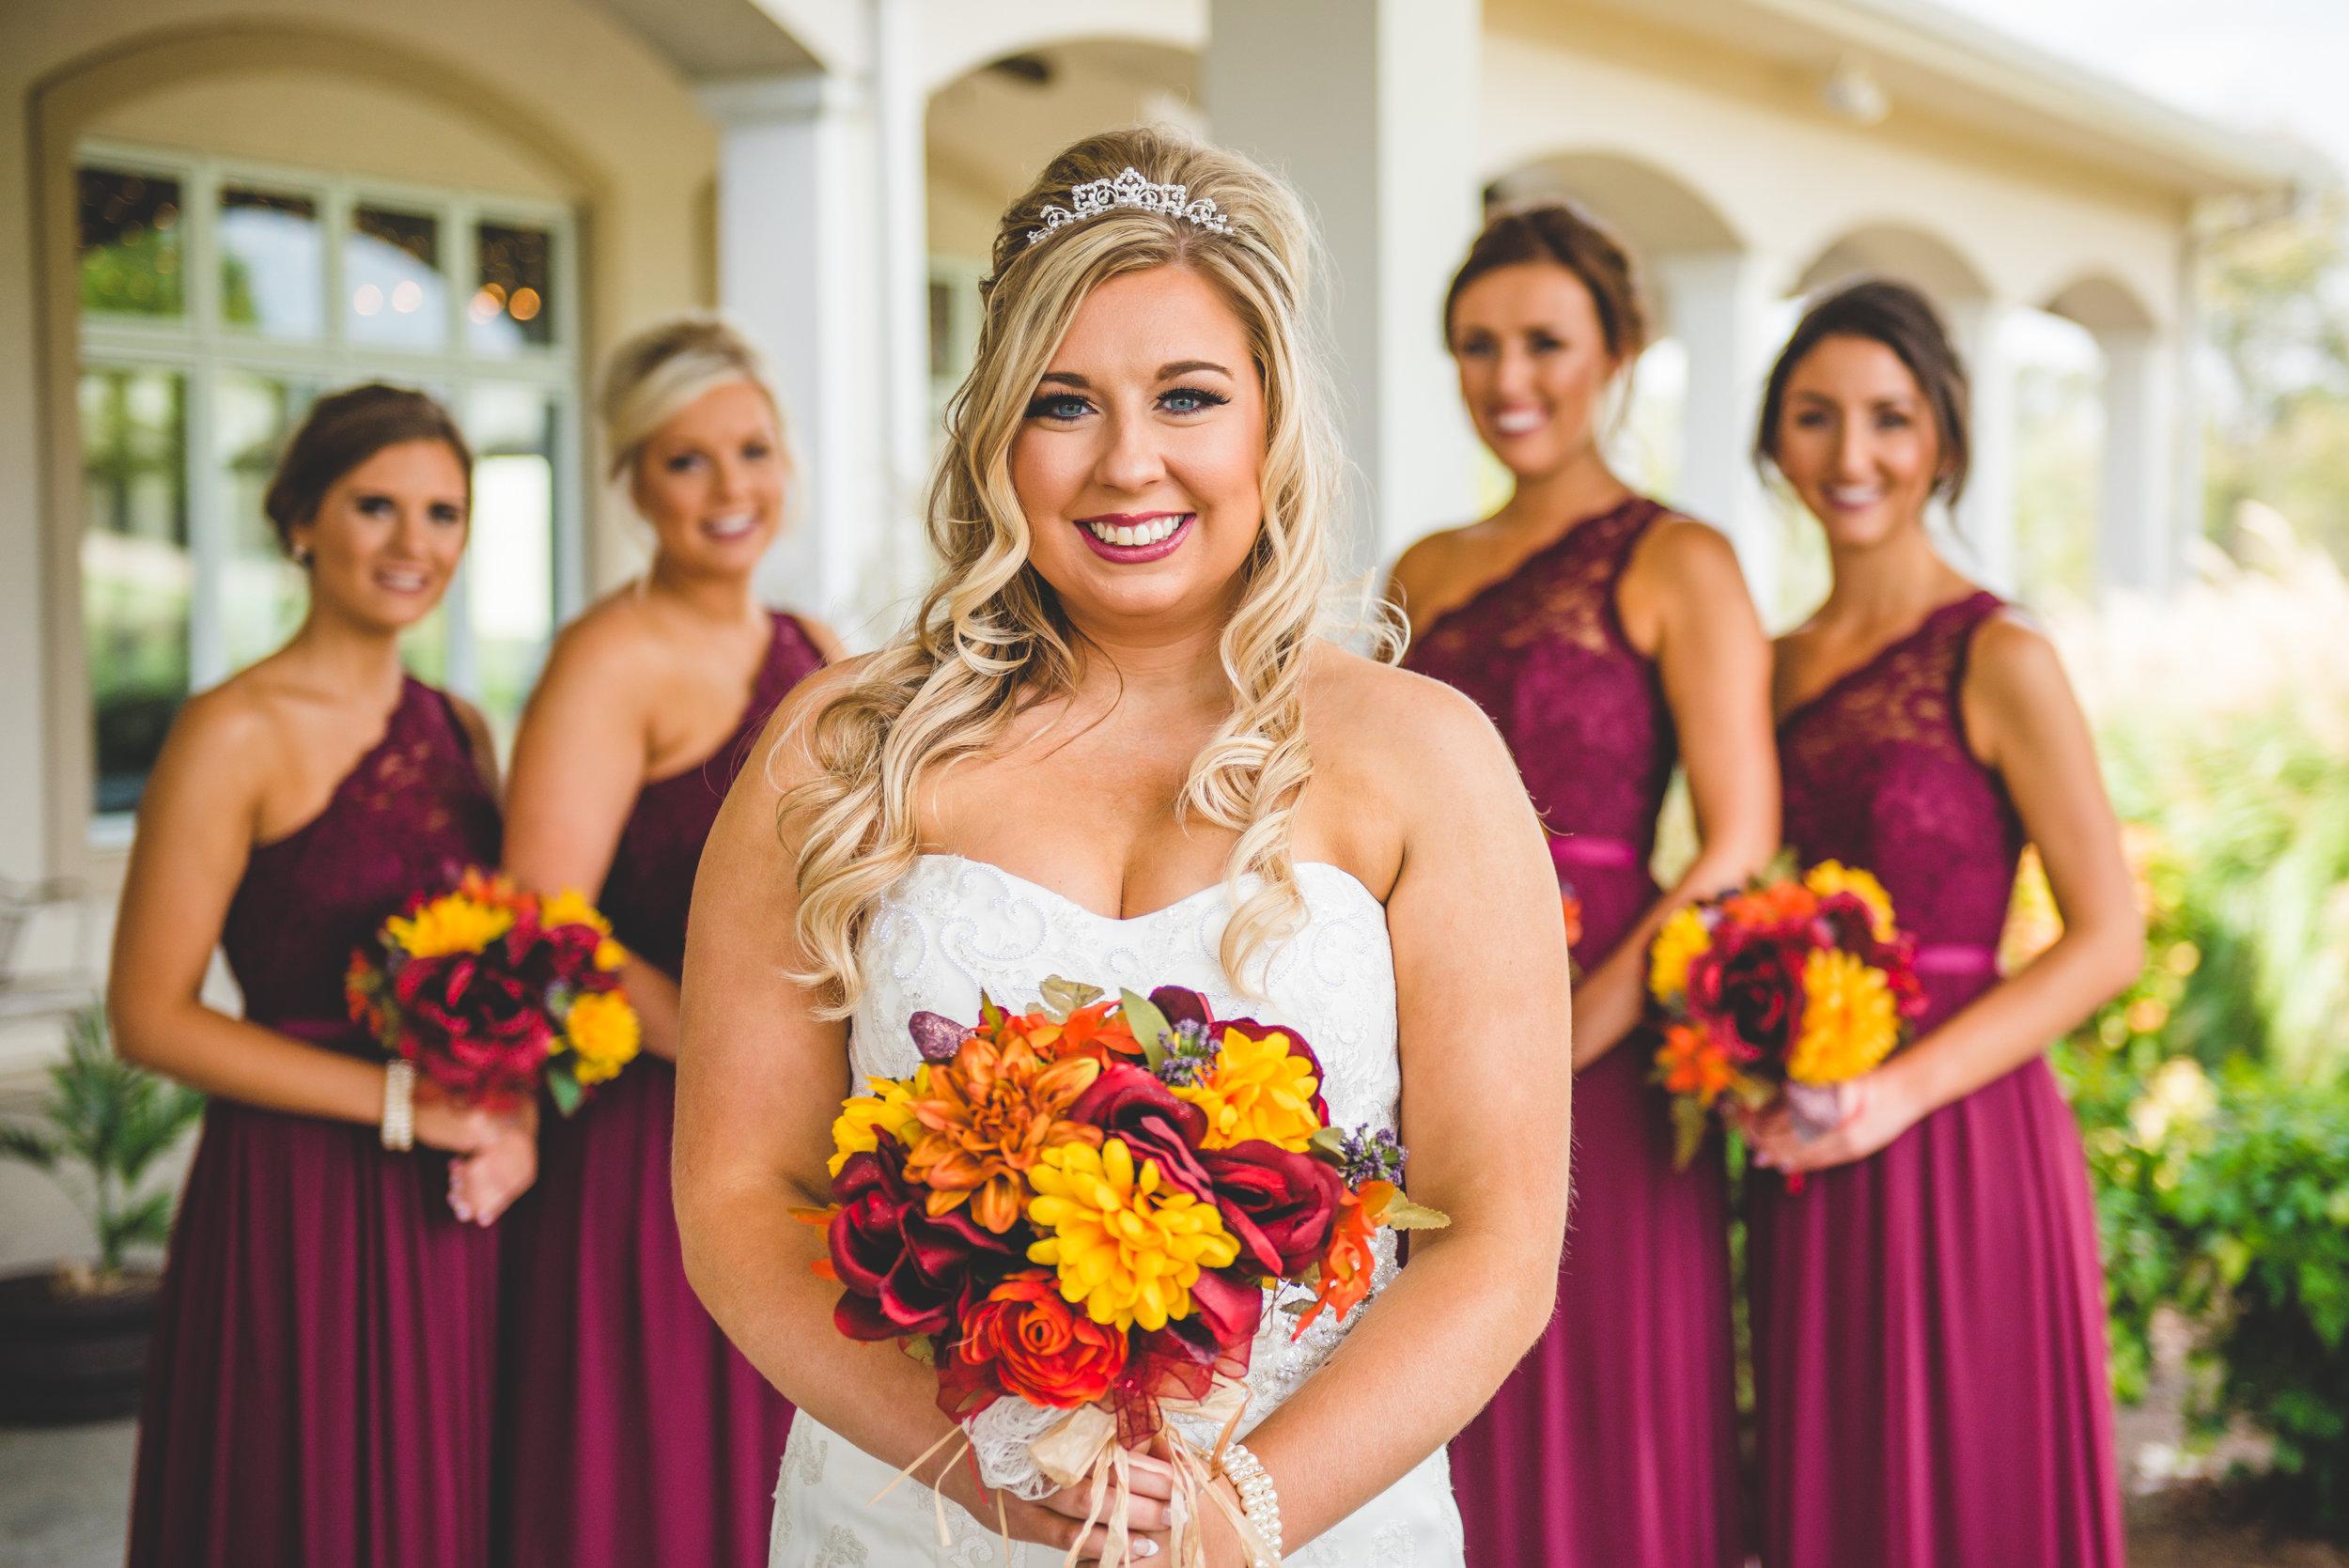 CCW - Creative Cure Weddings - Marissa and Nick - Southern Illinois Wedding Photography-1.jpg